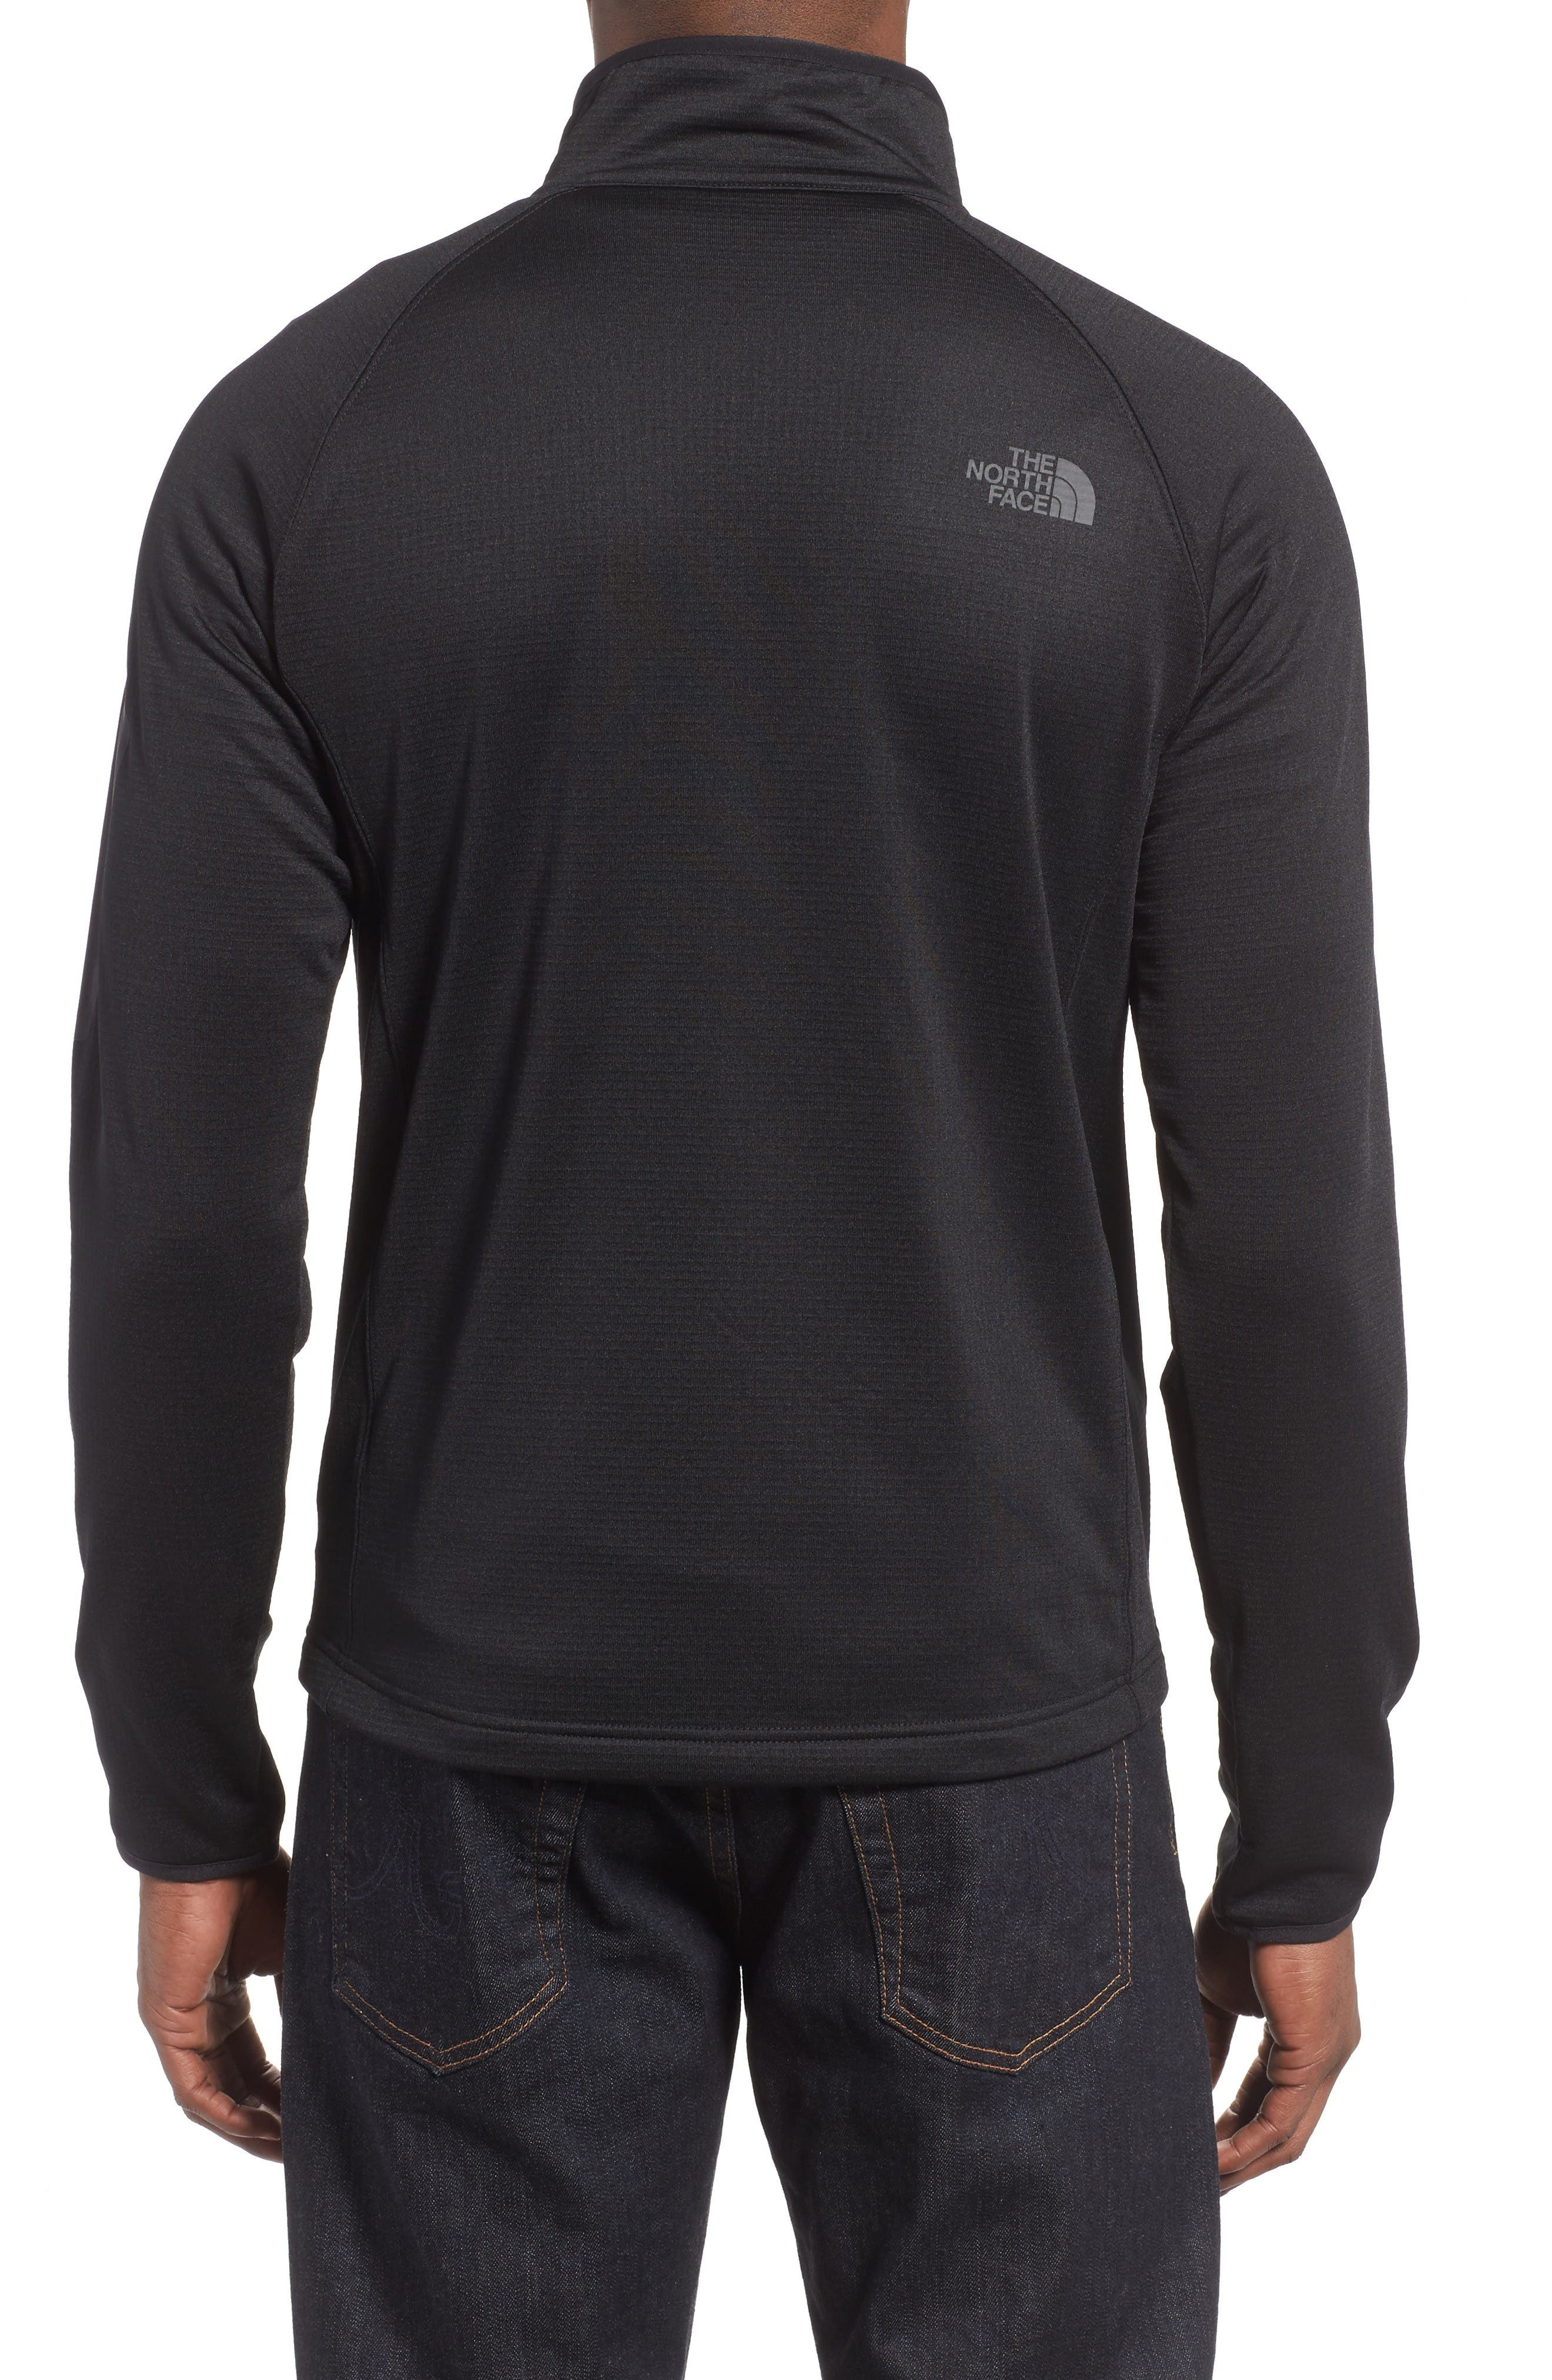 Borod Jacket,                             Alternate thumbnail 2, color,                             Tnf Black/ Tnf Black